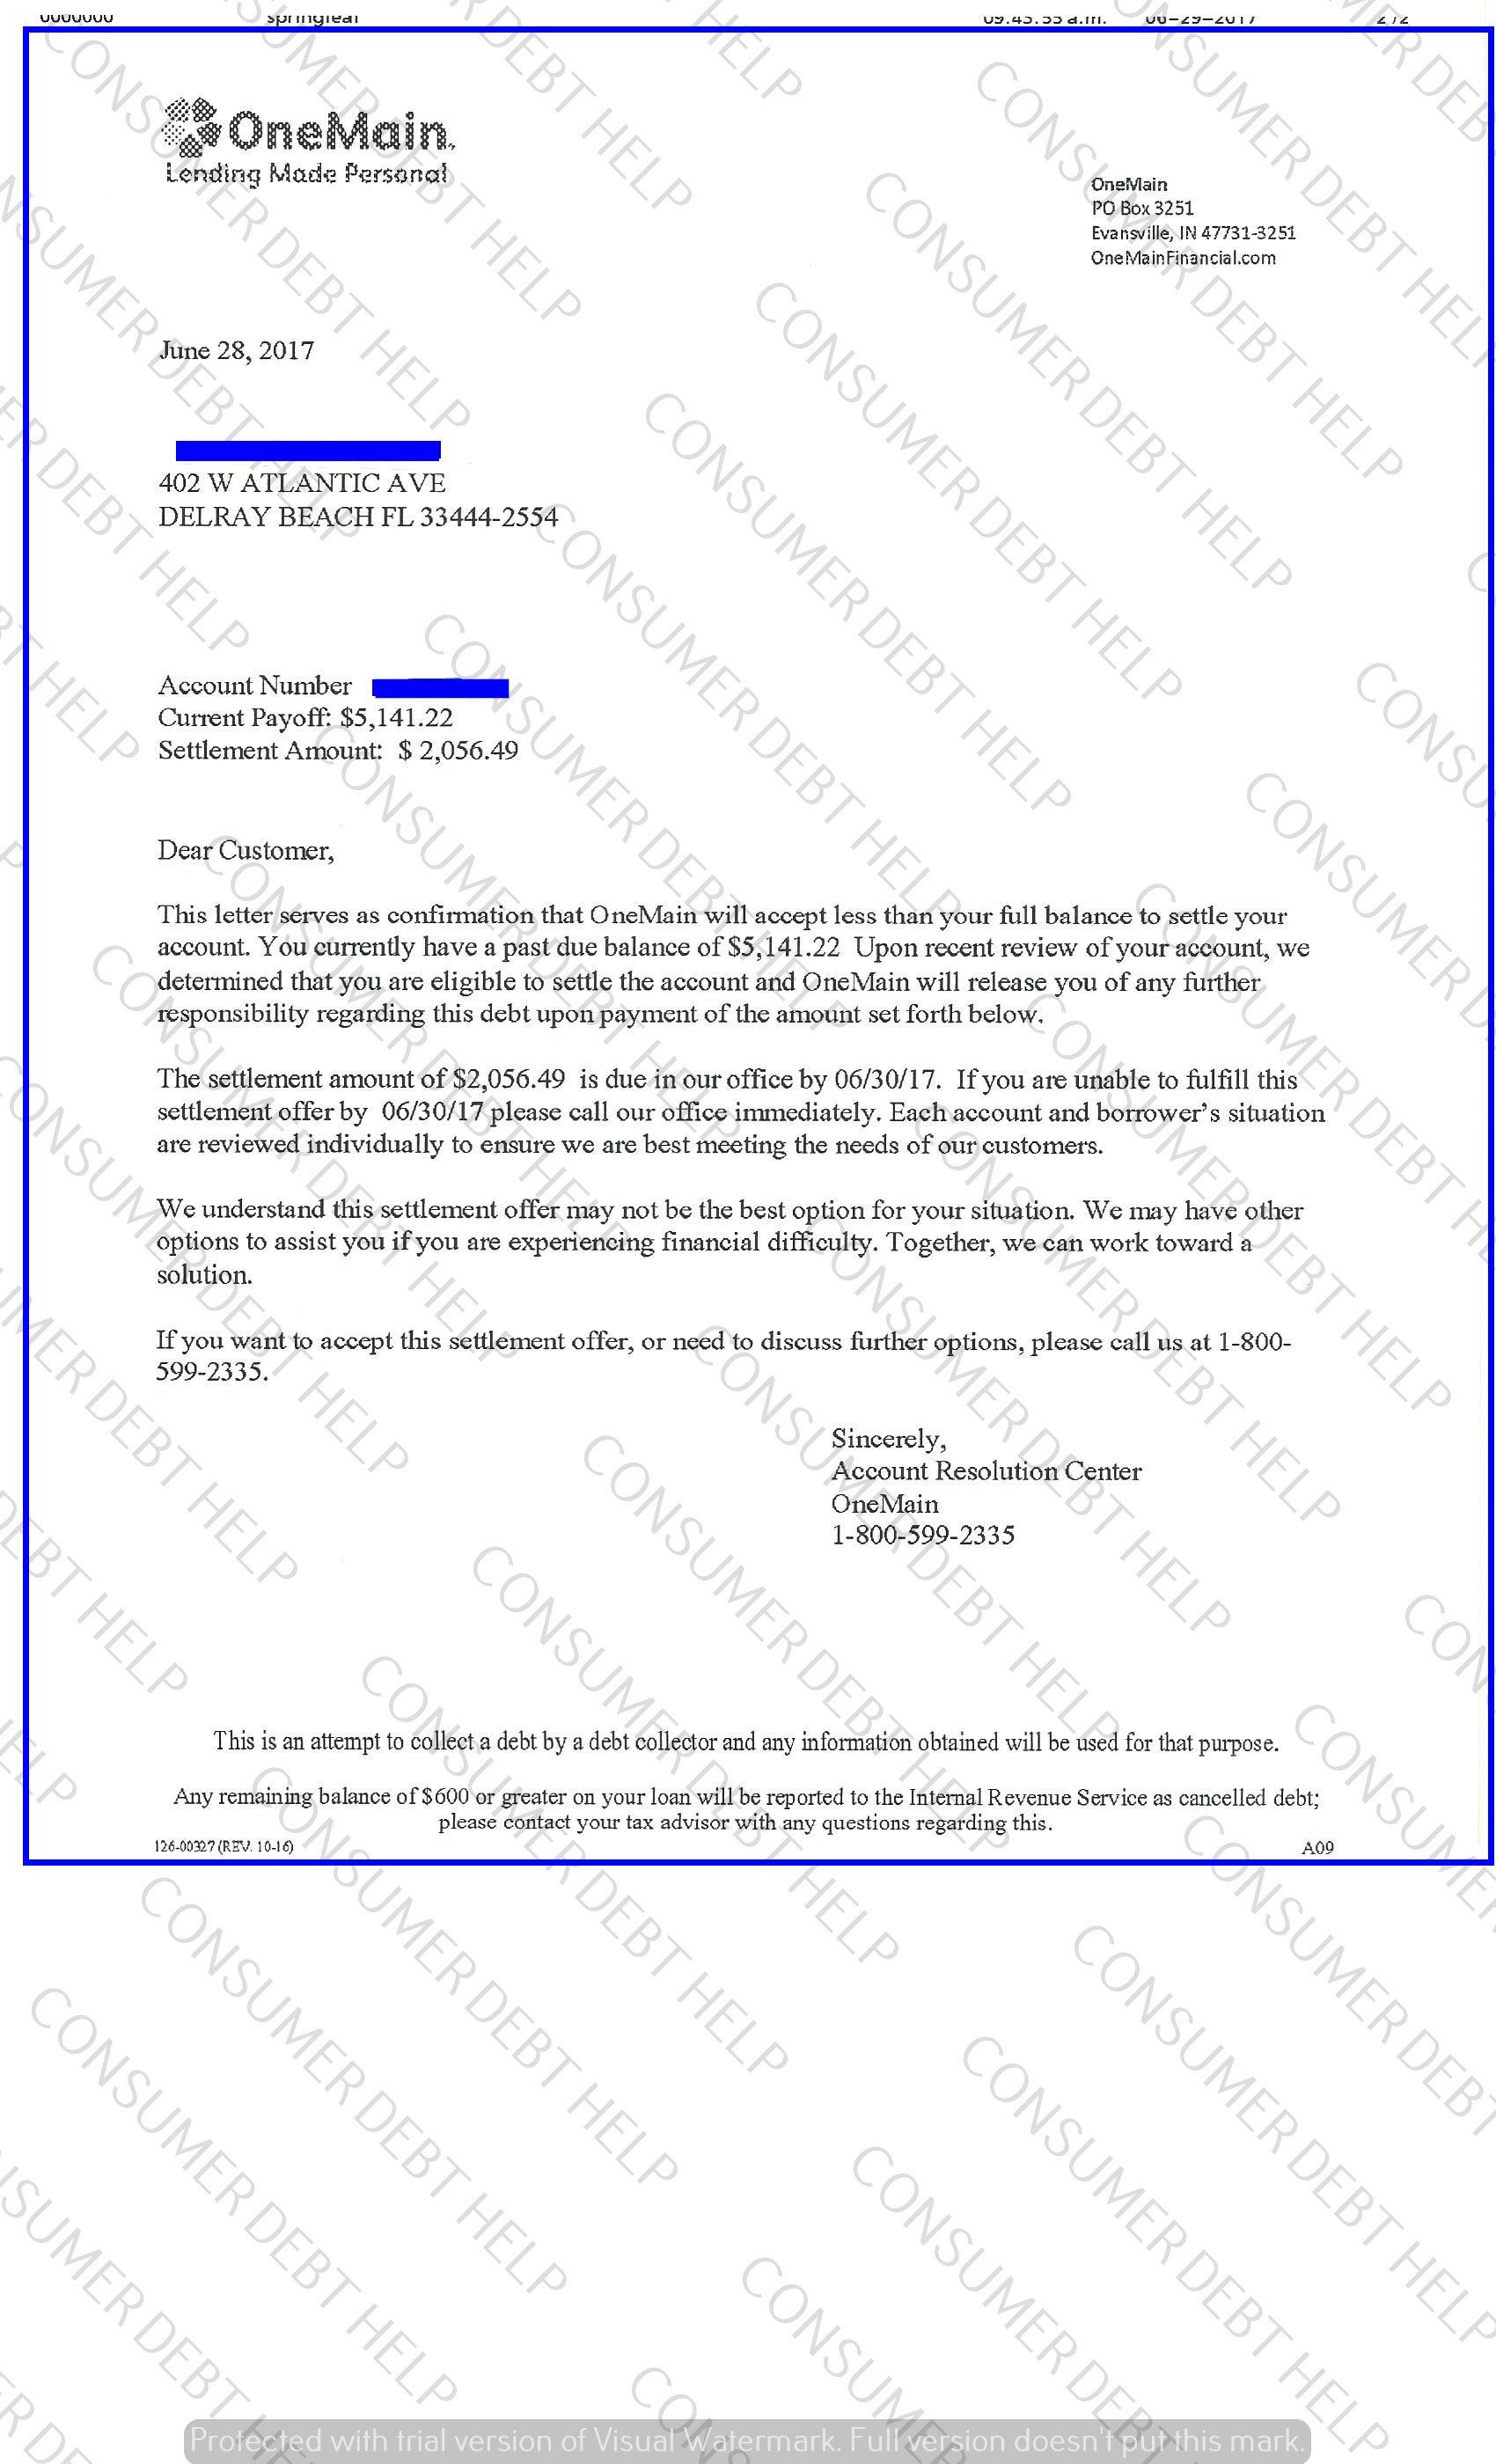 Settlement Letters From One Main Consumer BEBT HELP ASSOCIATION